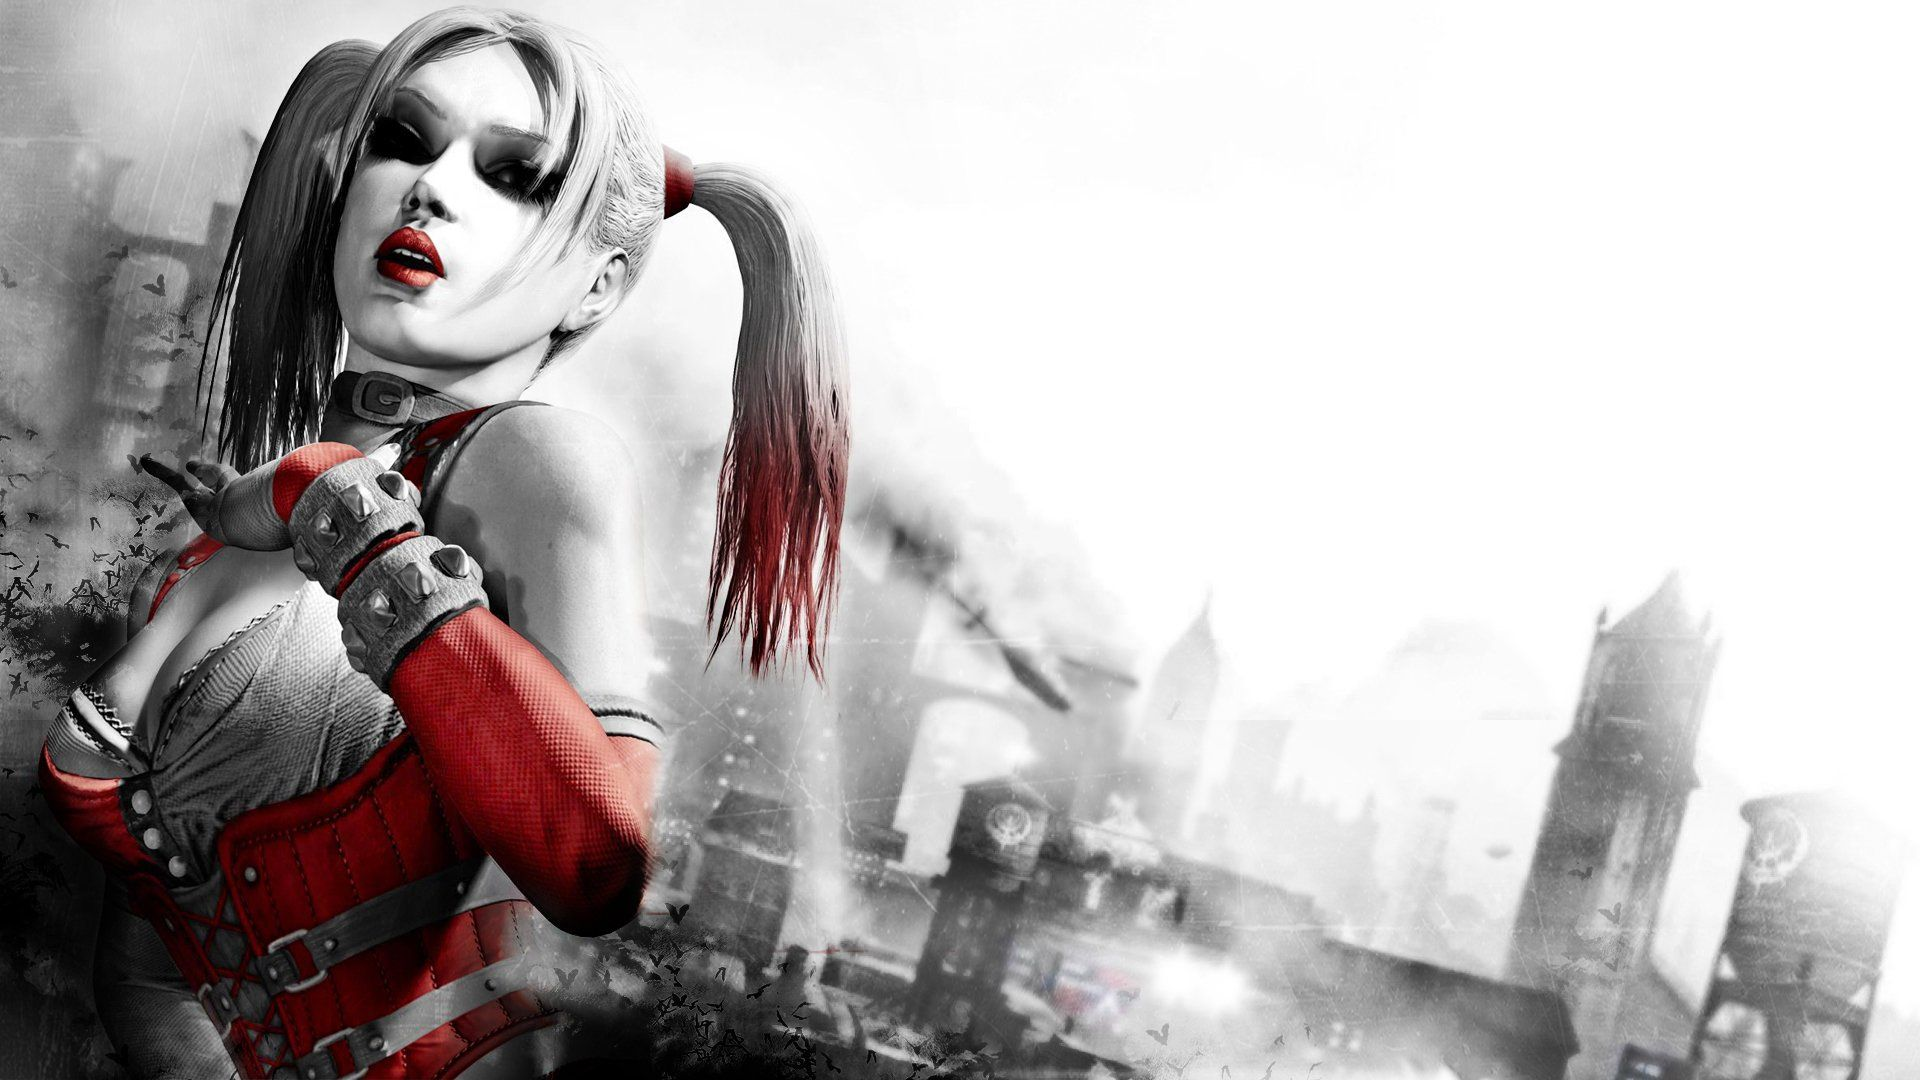 Harley Quinn Arkham City Wallpapers Top Free Harley Quinn